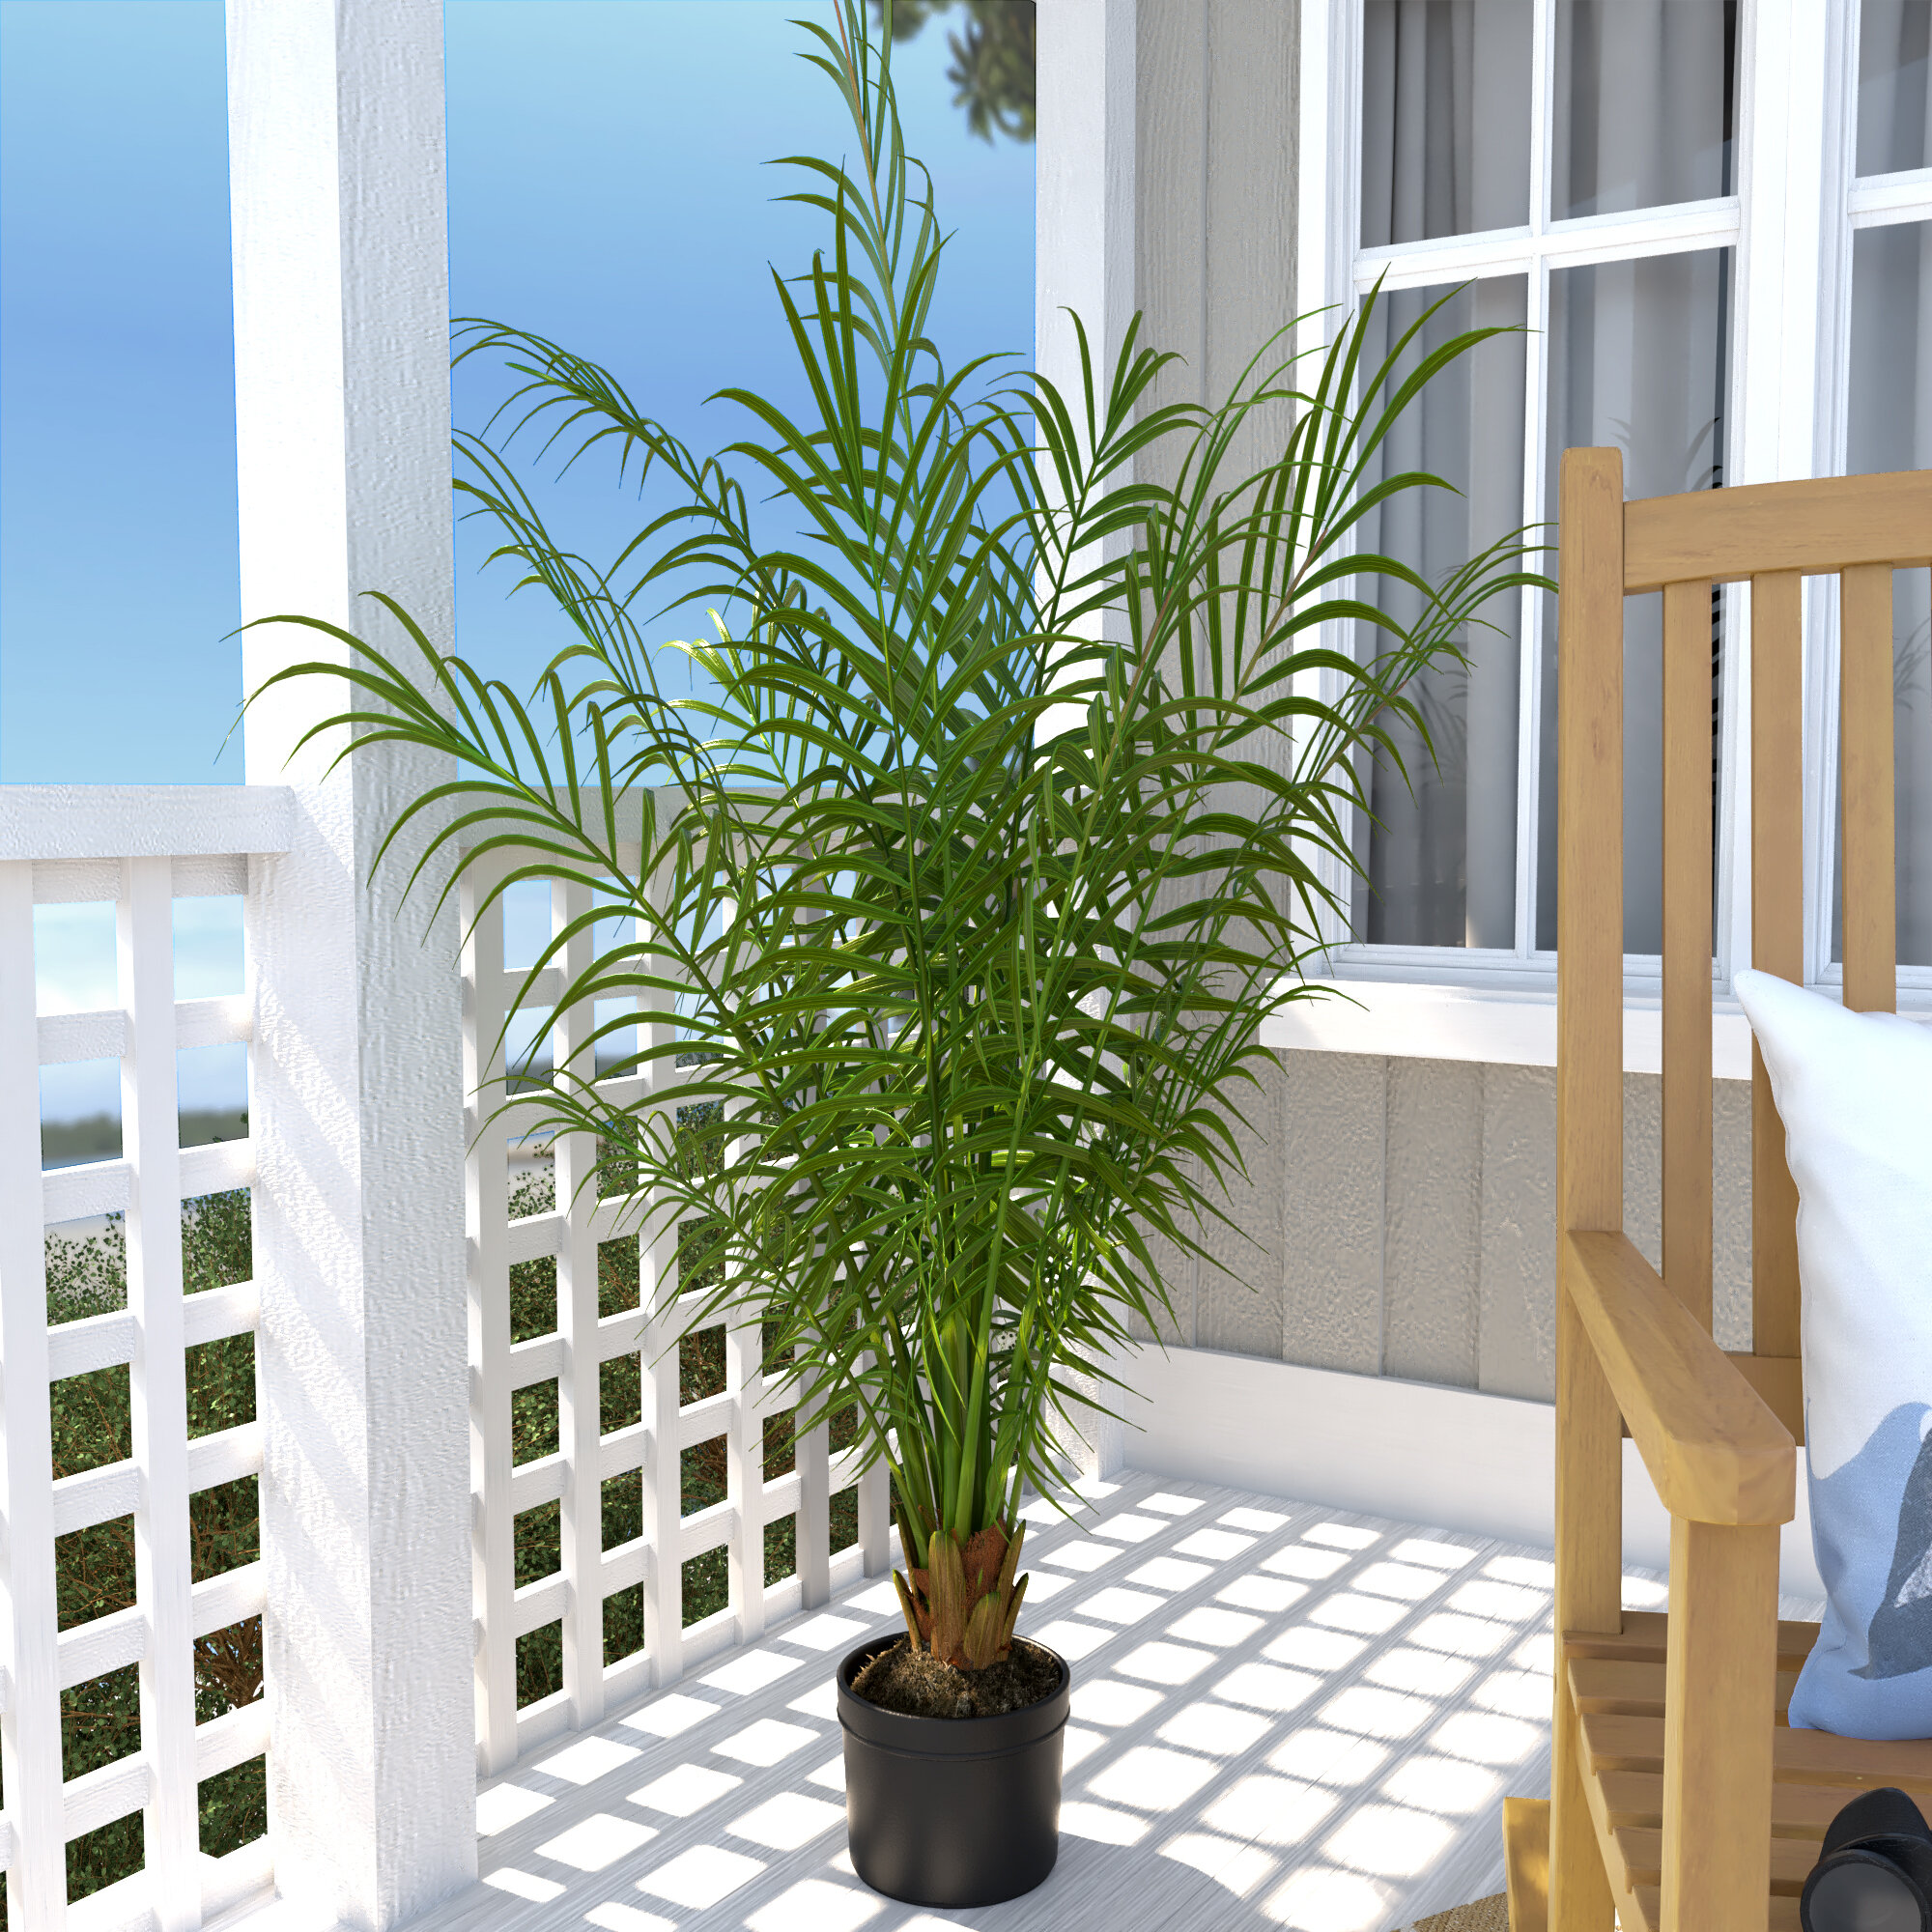 Areca Palm Tree in Pot